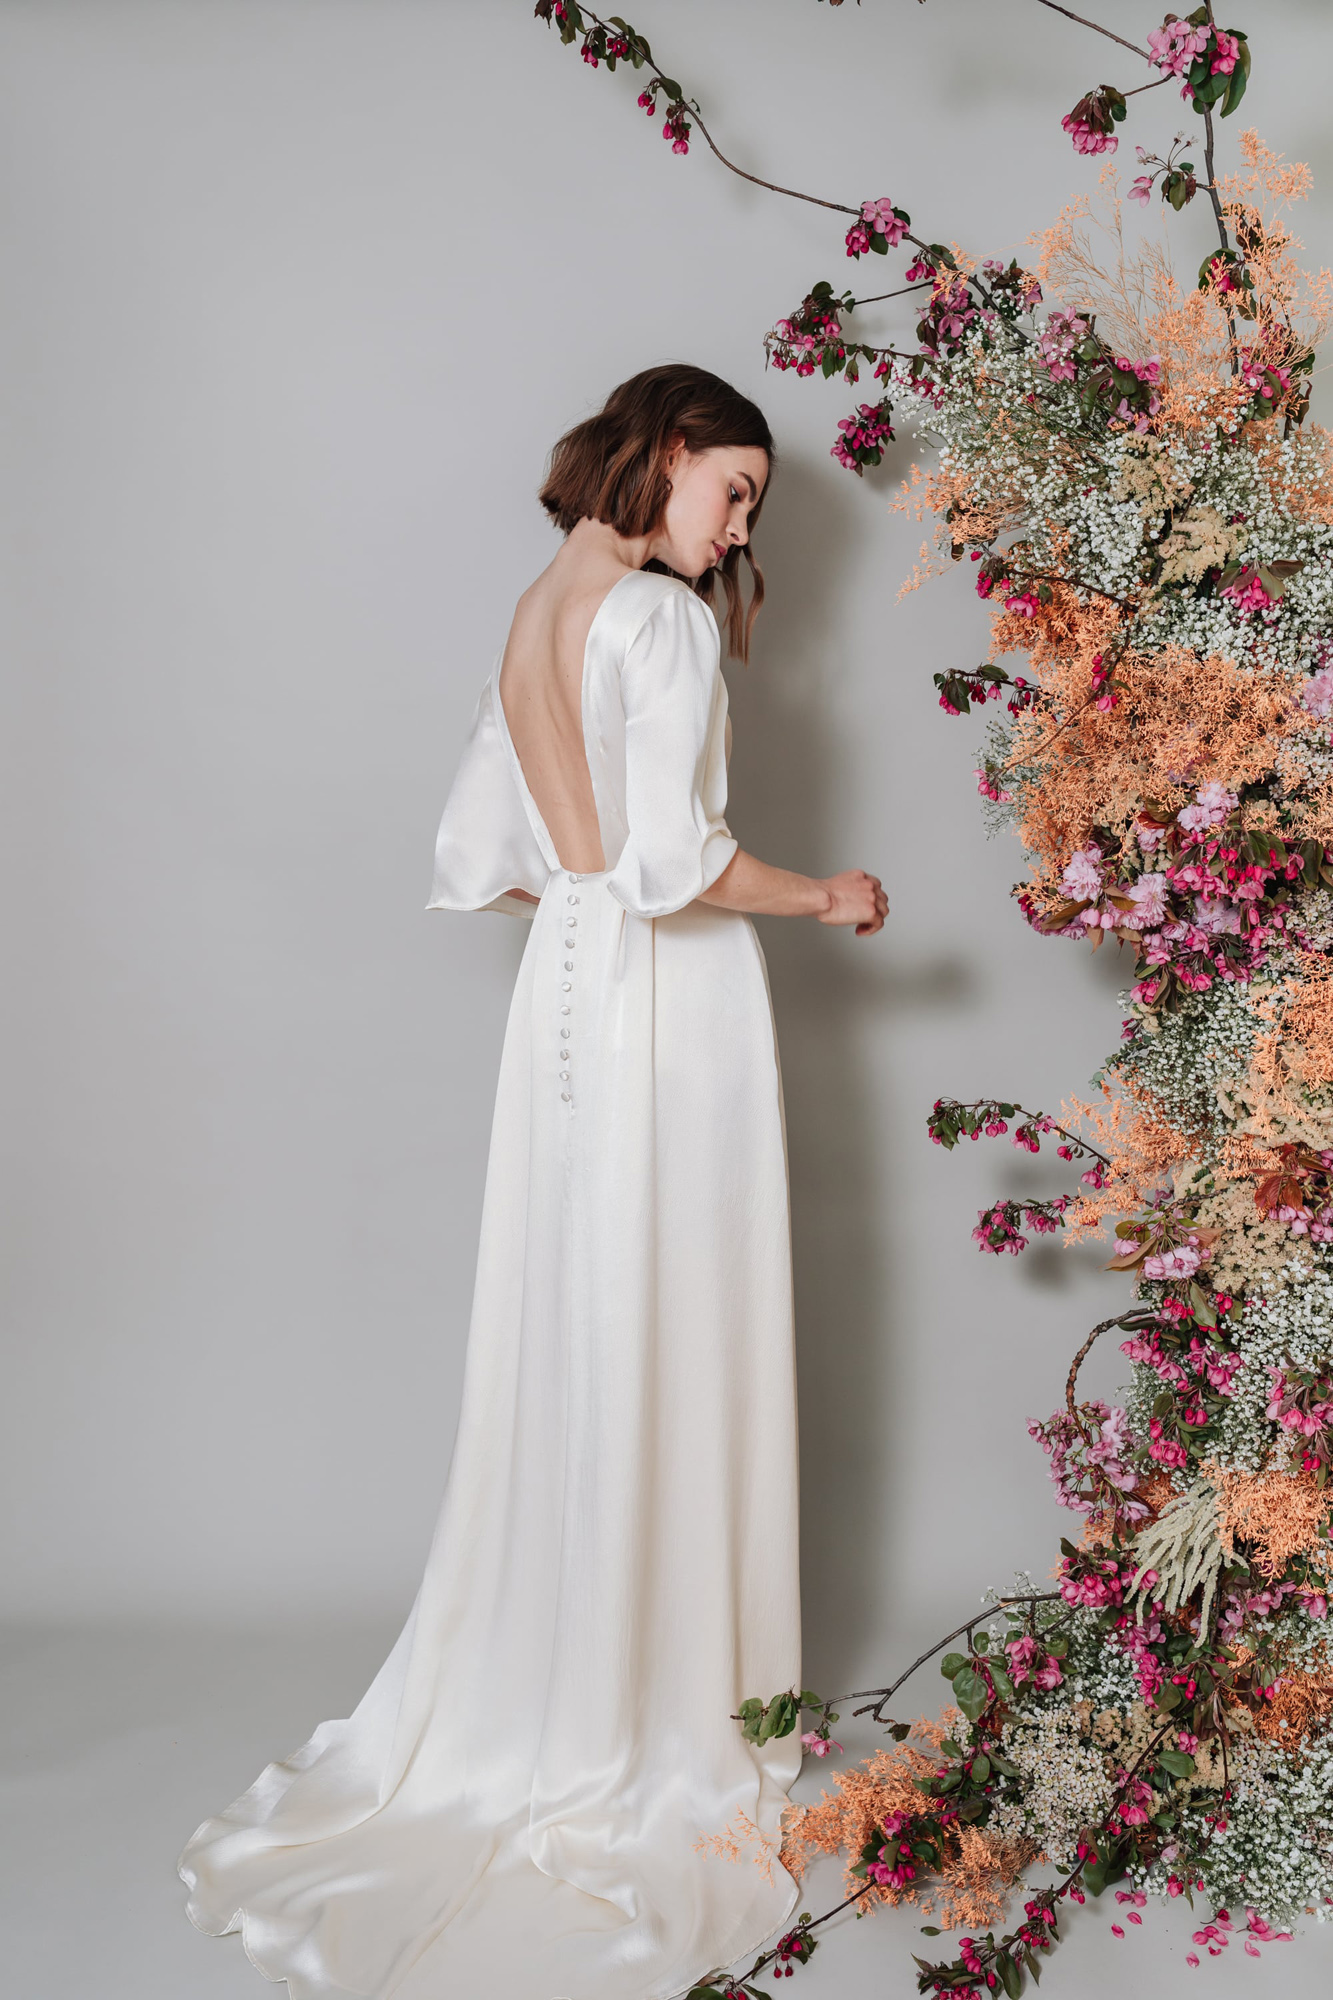 Kate-Beaumont-Lunaria-Bohemian-Hammered-Silk-Wedding-Dress-Sleeves-11.jpg